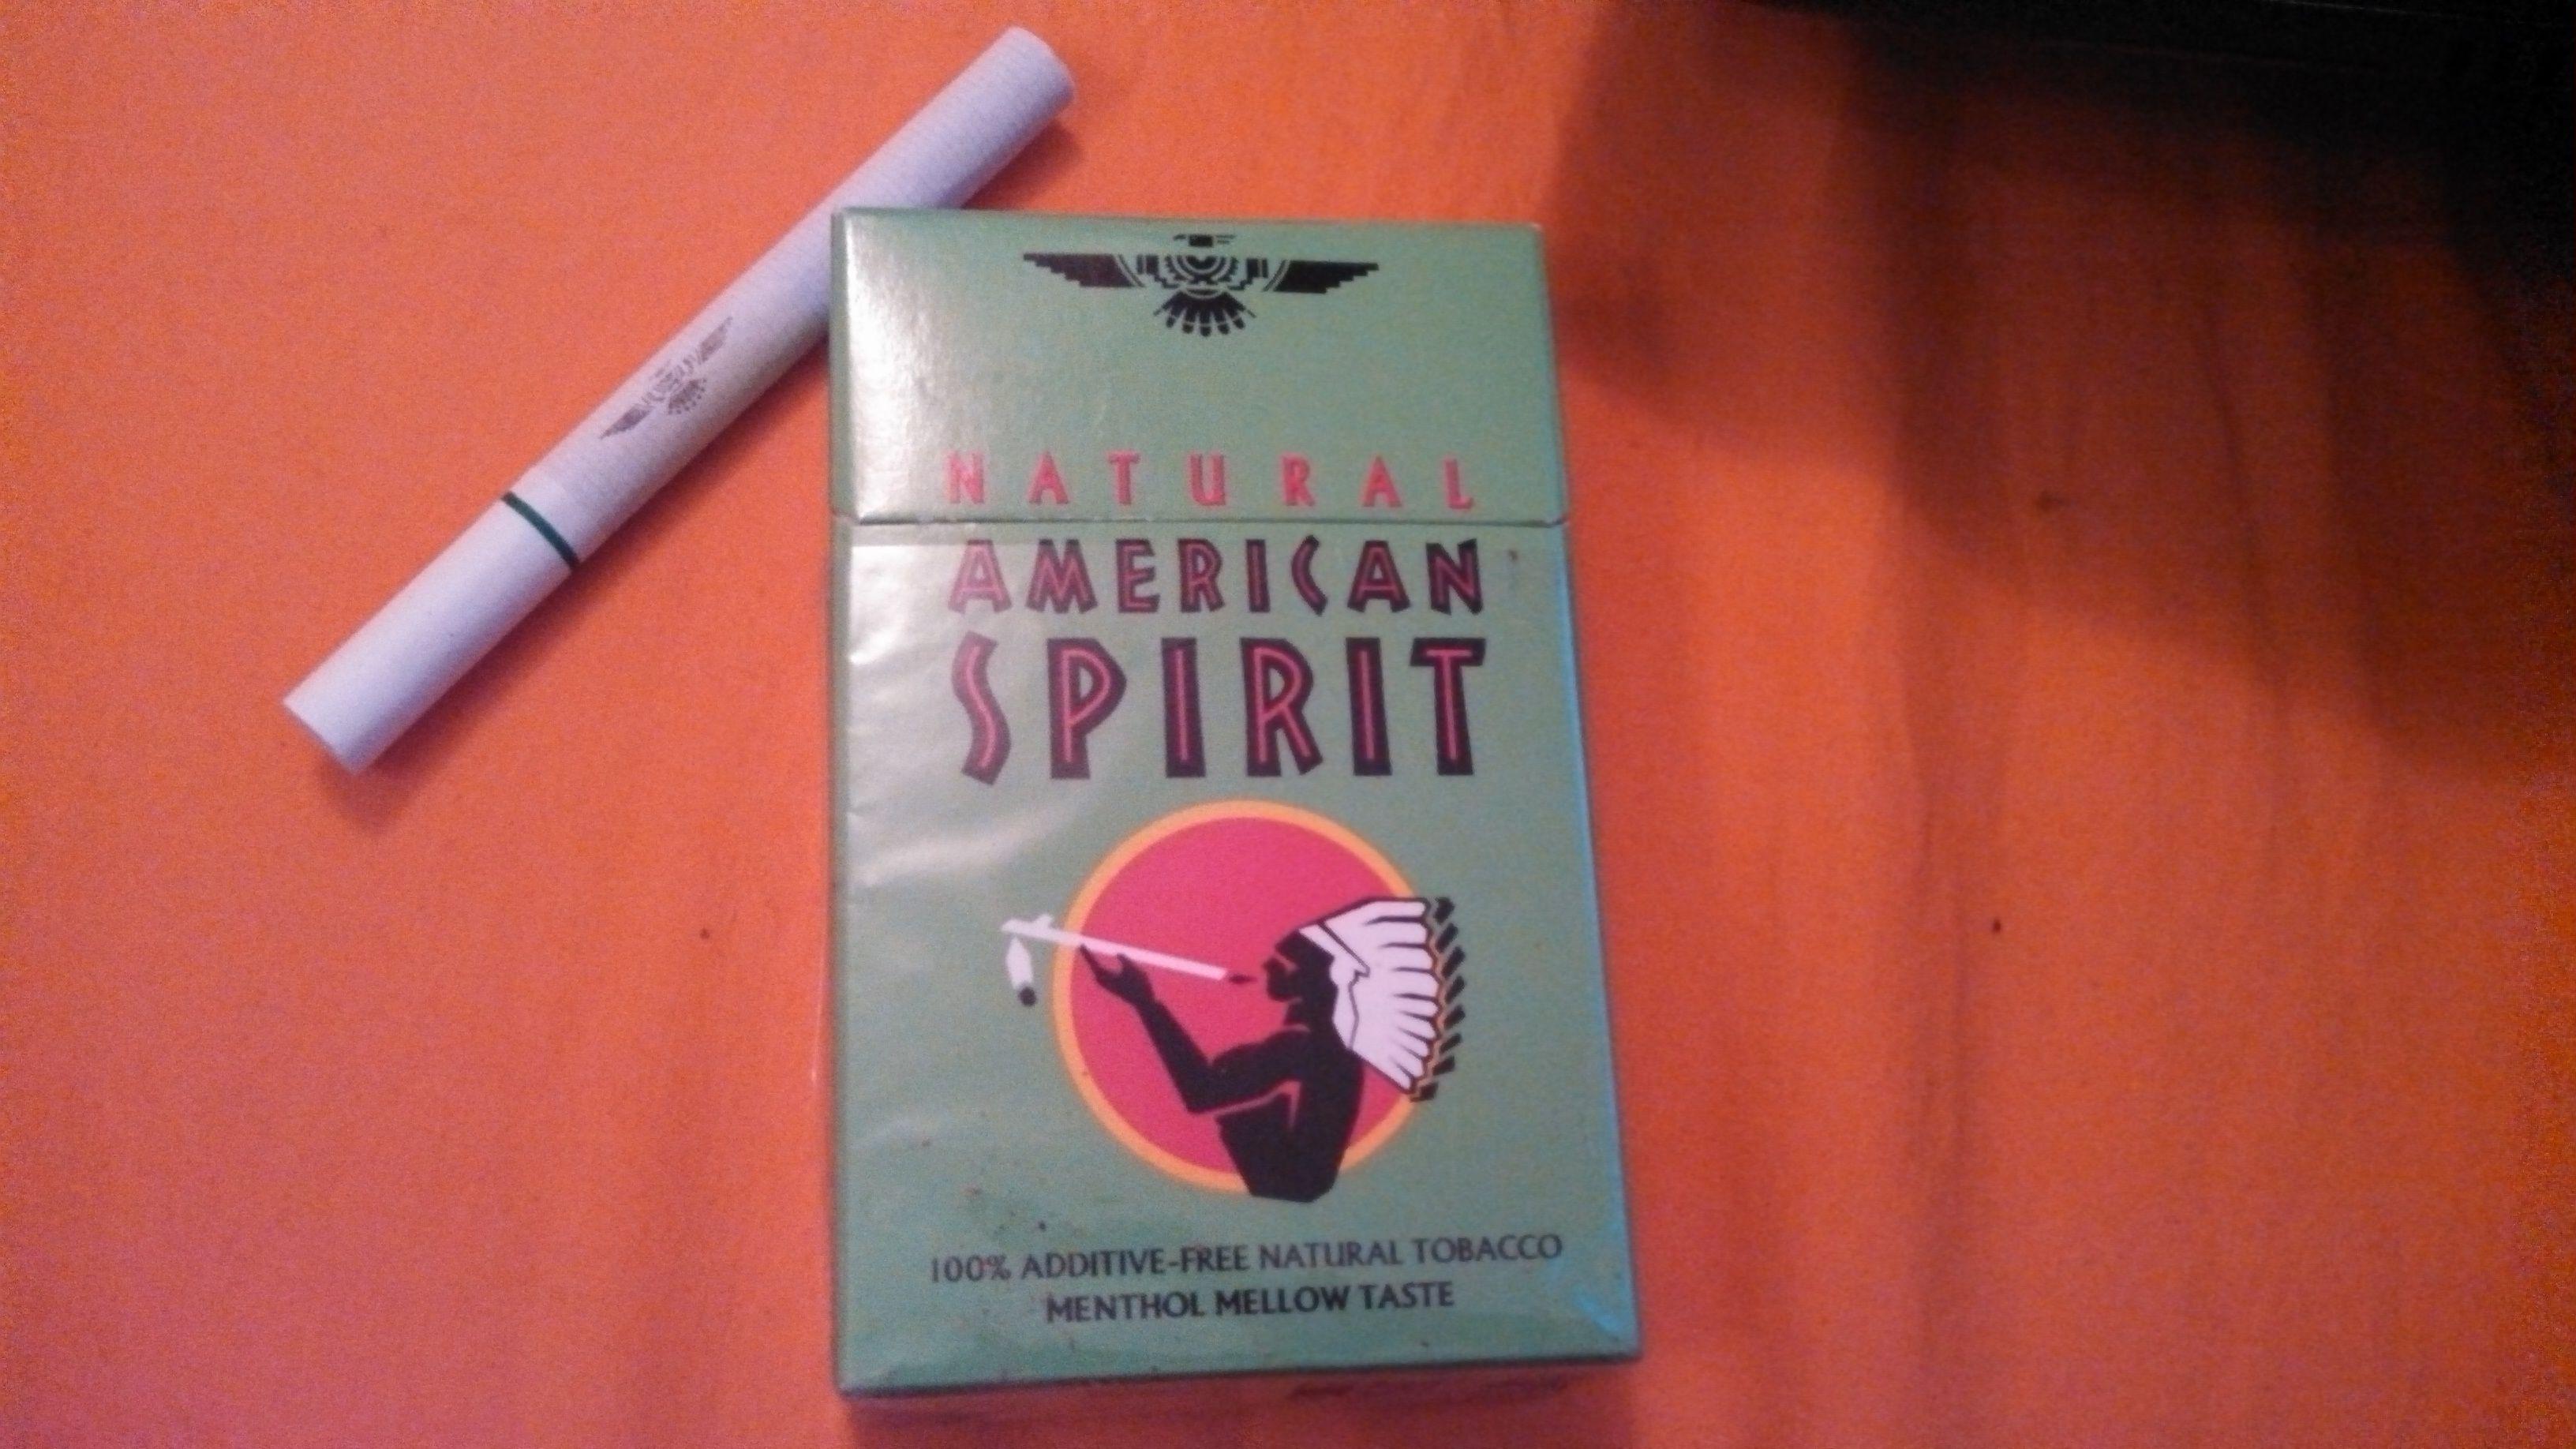 American spirit cigarettes nyc price cigarette tobacco stores online